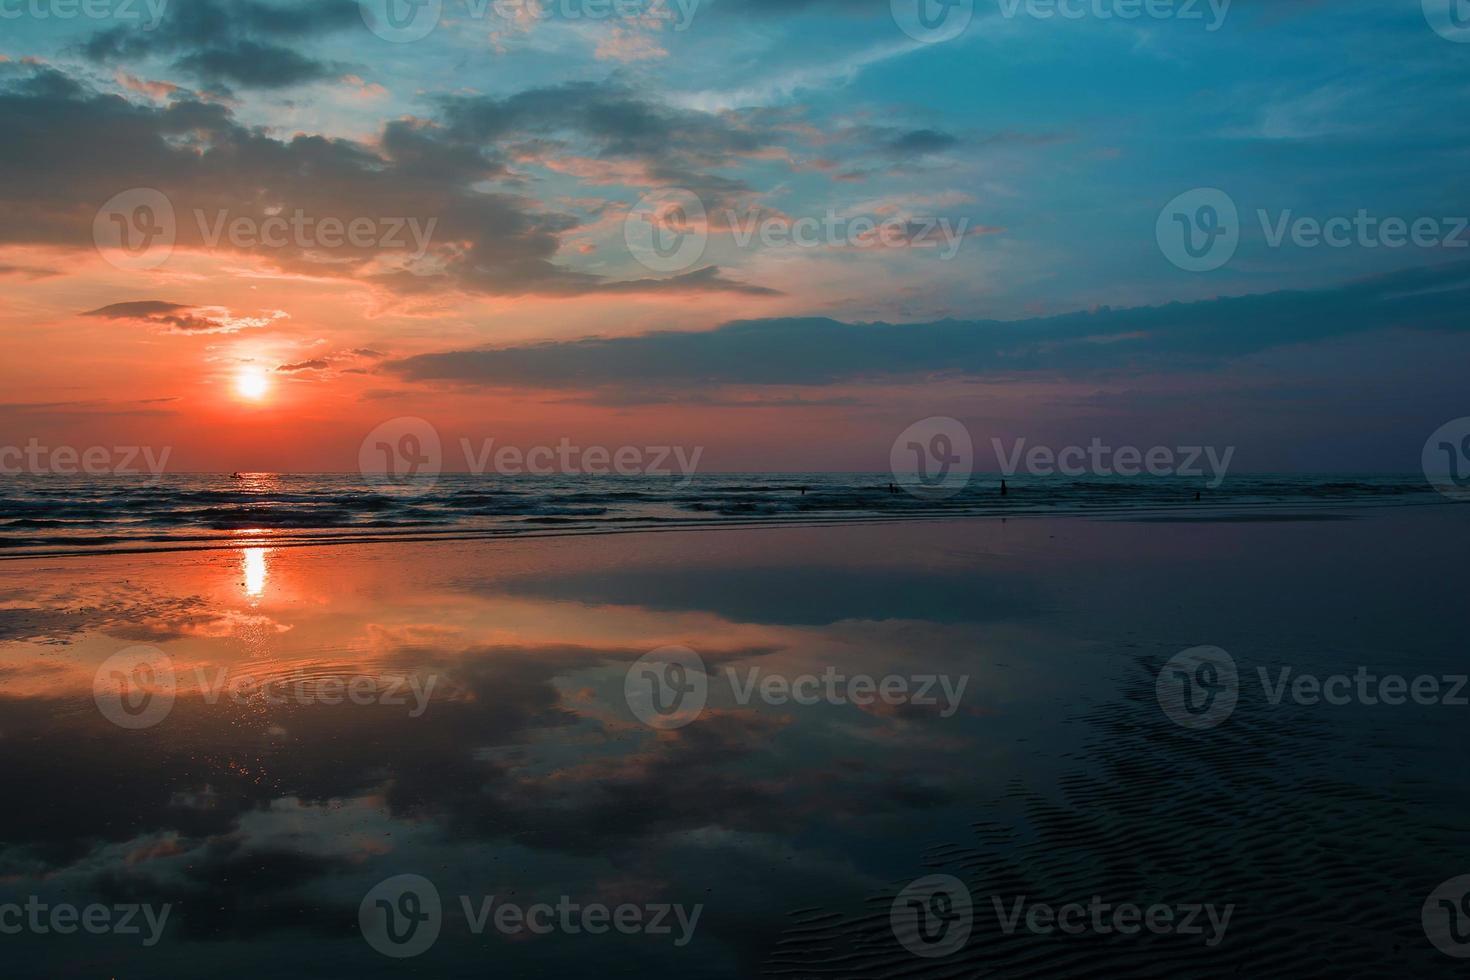 Malignant sunrise to sunset red sky at sea. photo